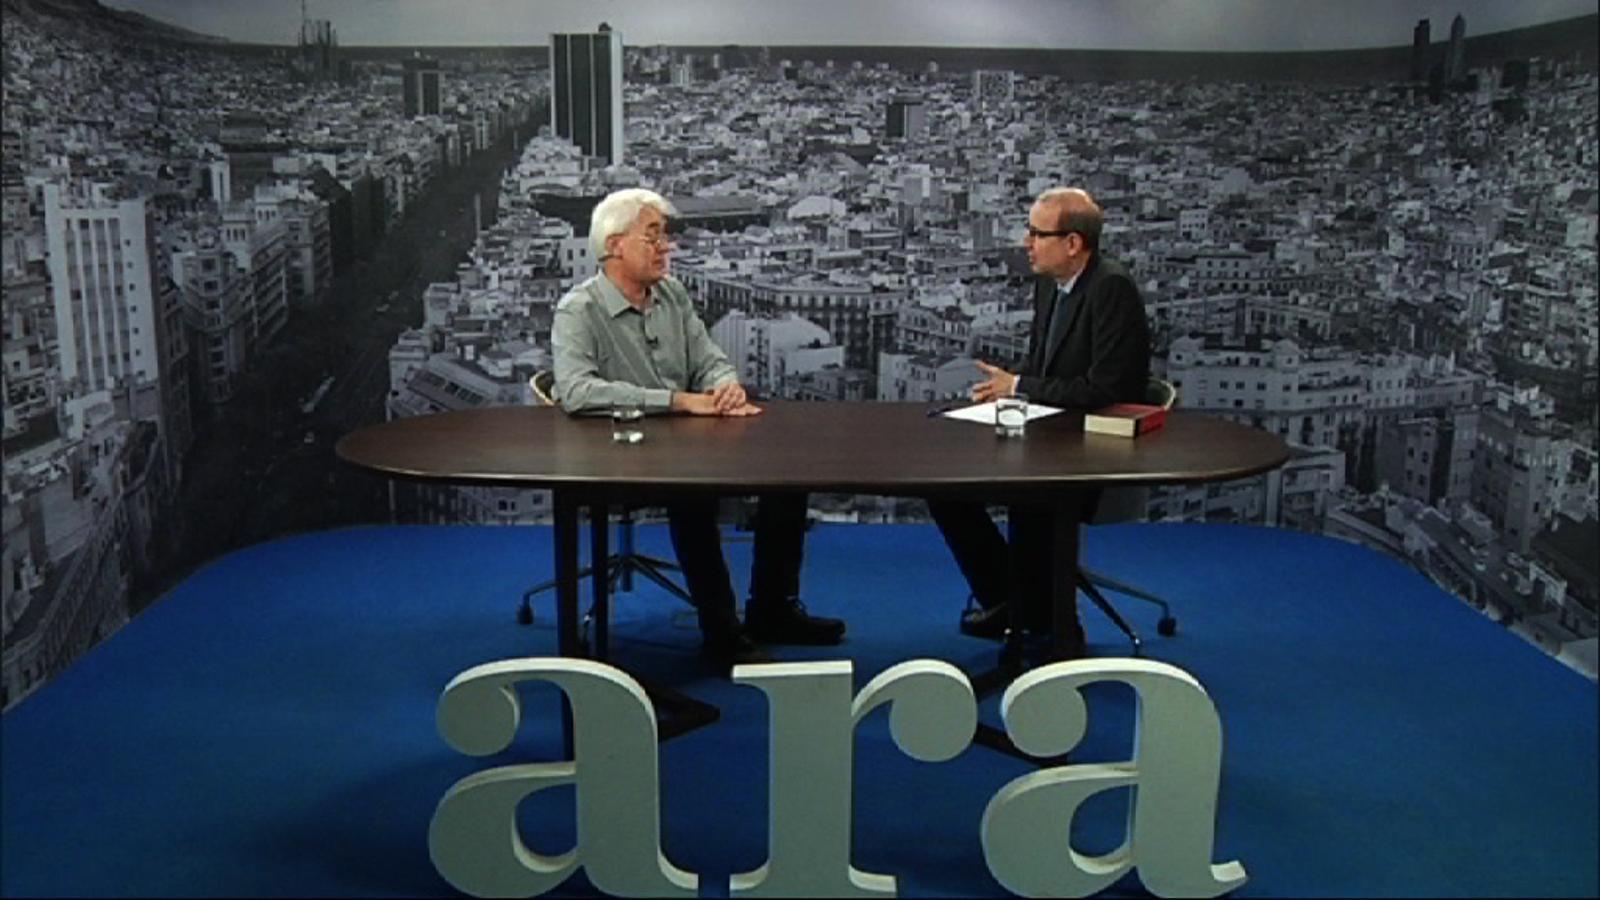 Entrevista d'Antoni Bassas a Klaus-Jürgen Naguen